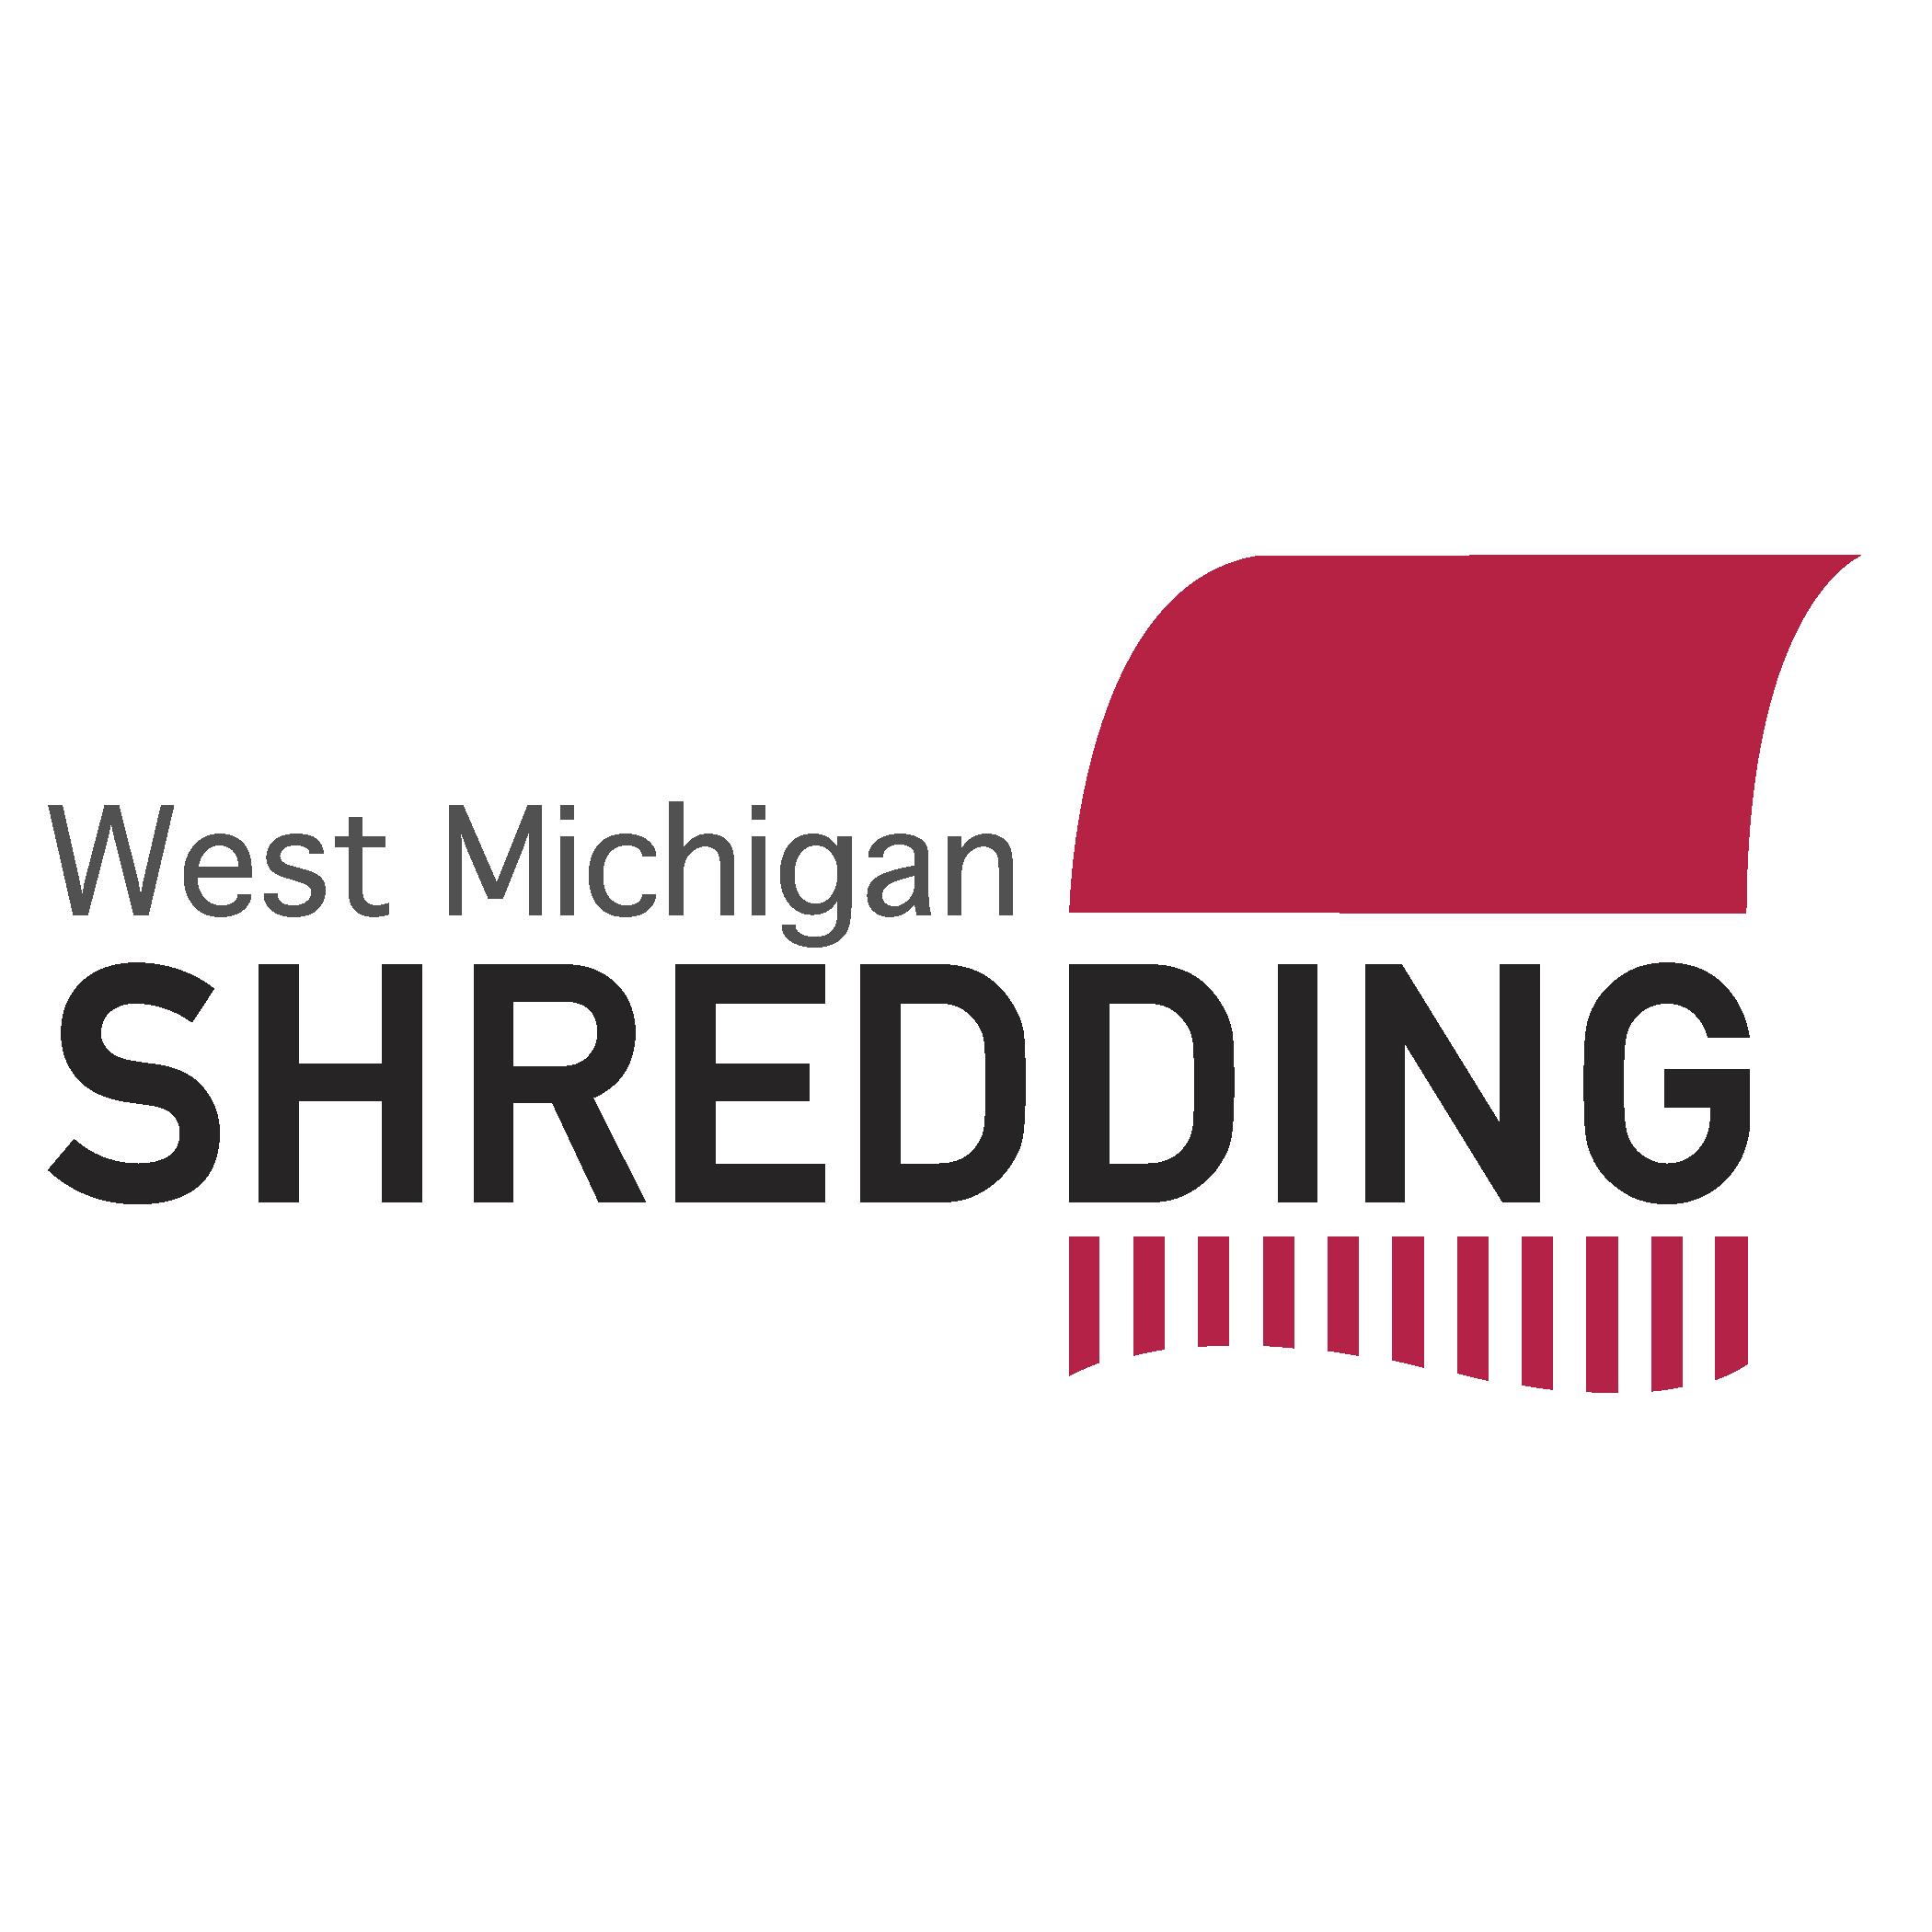 West Michigan Shredding